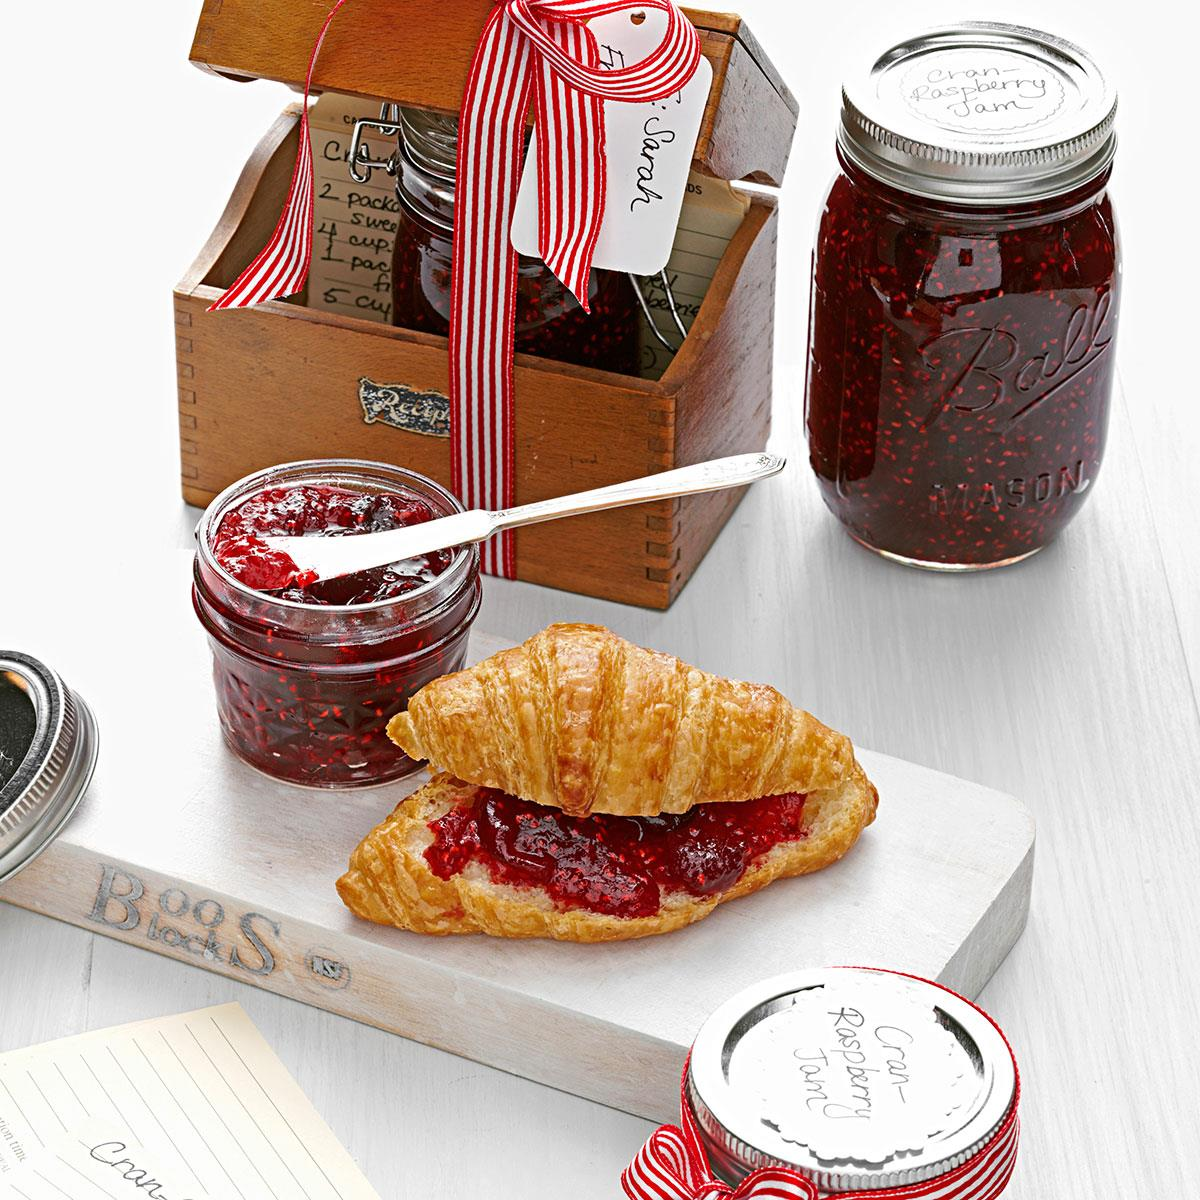 Cran-Raspberry Jam image